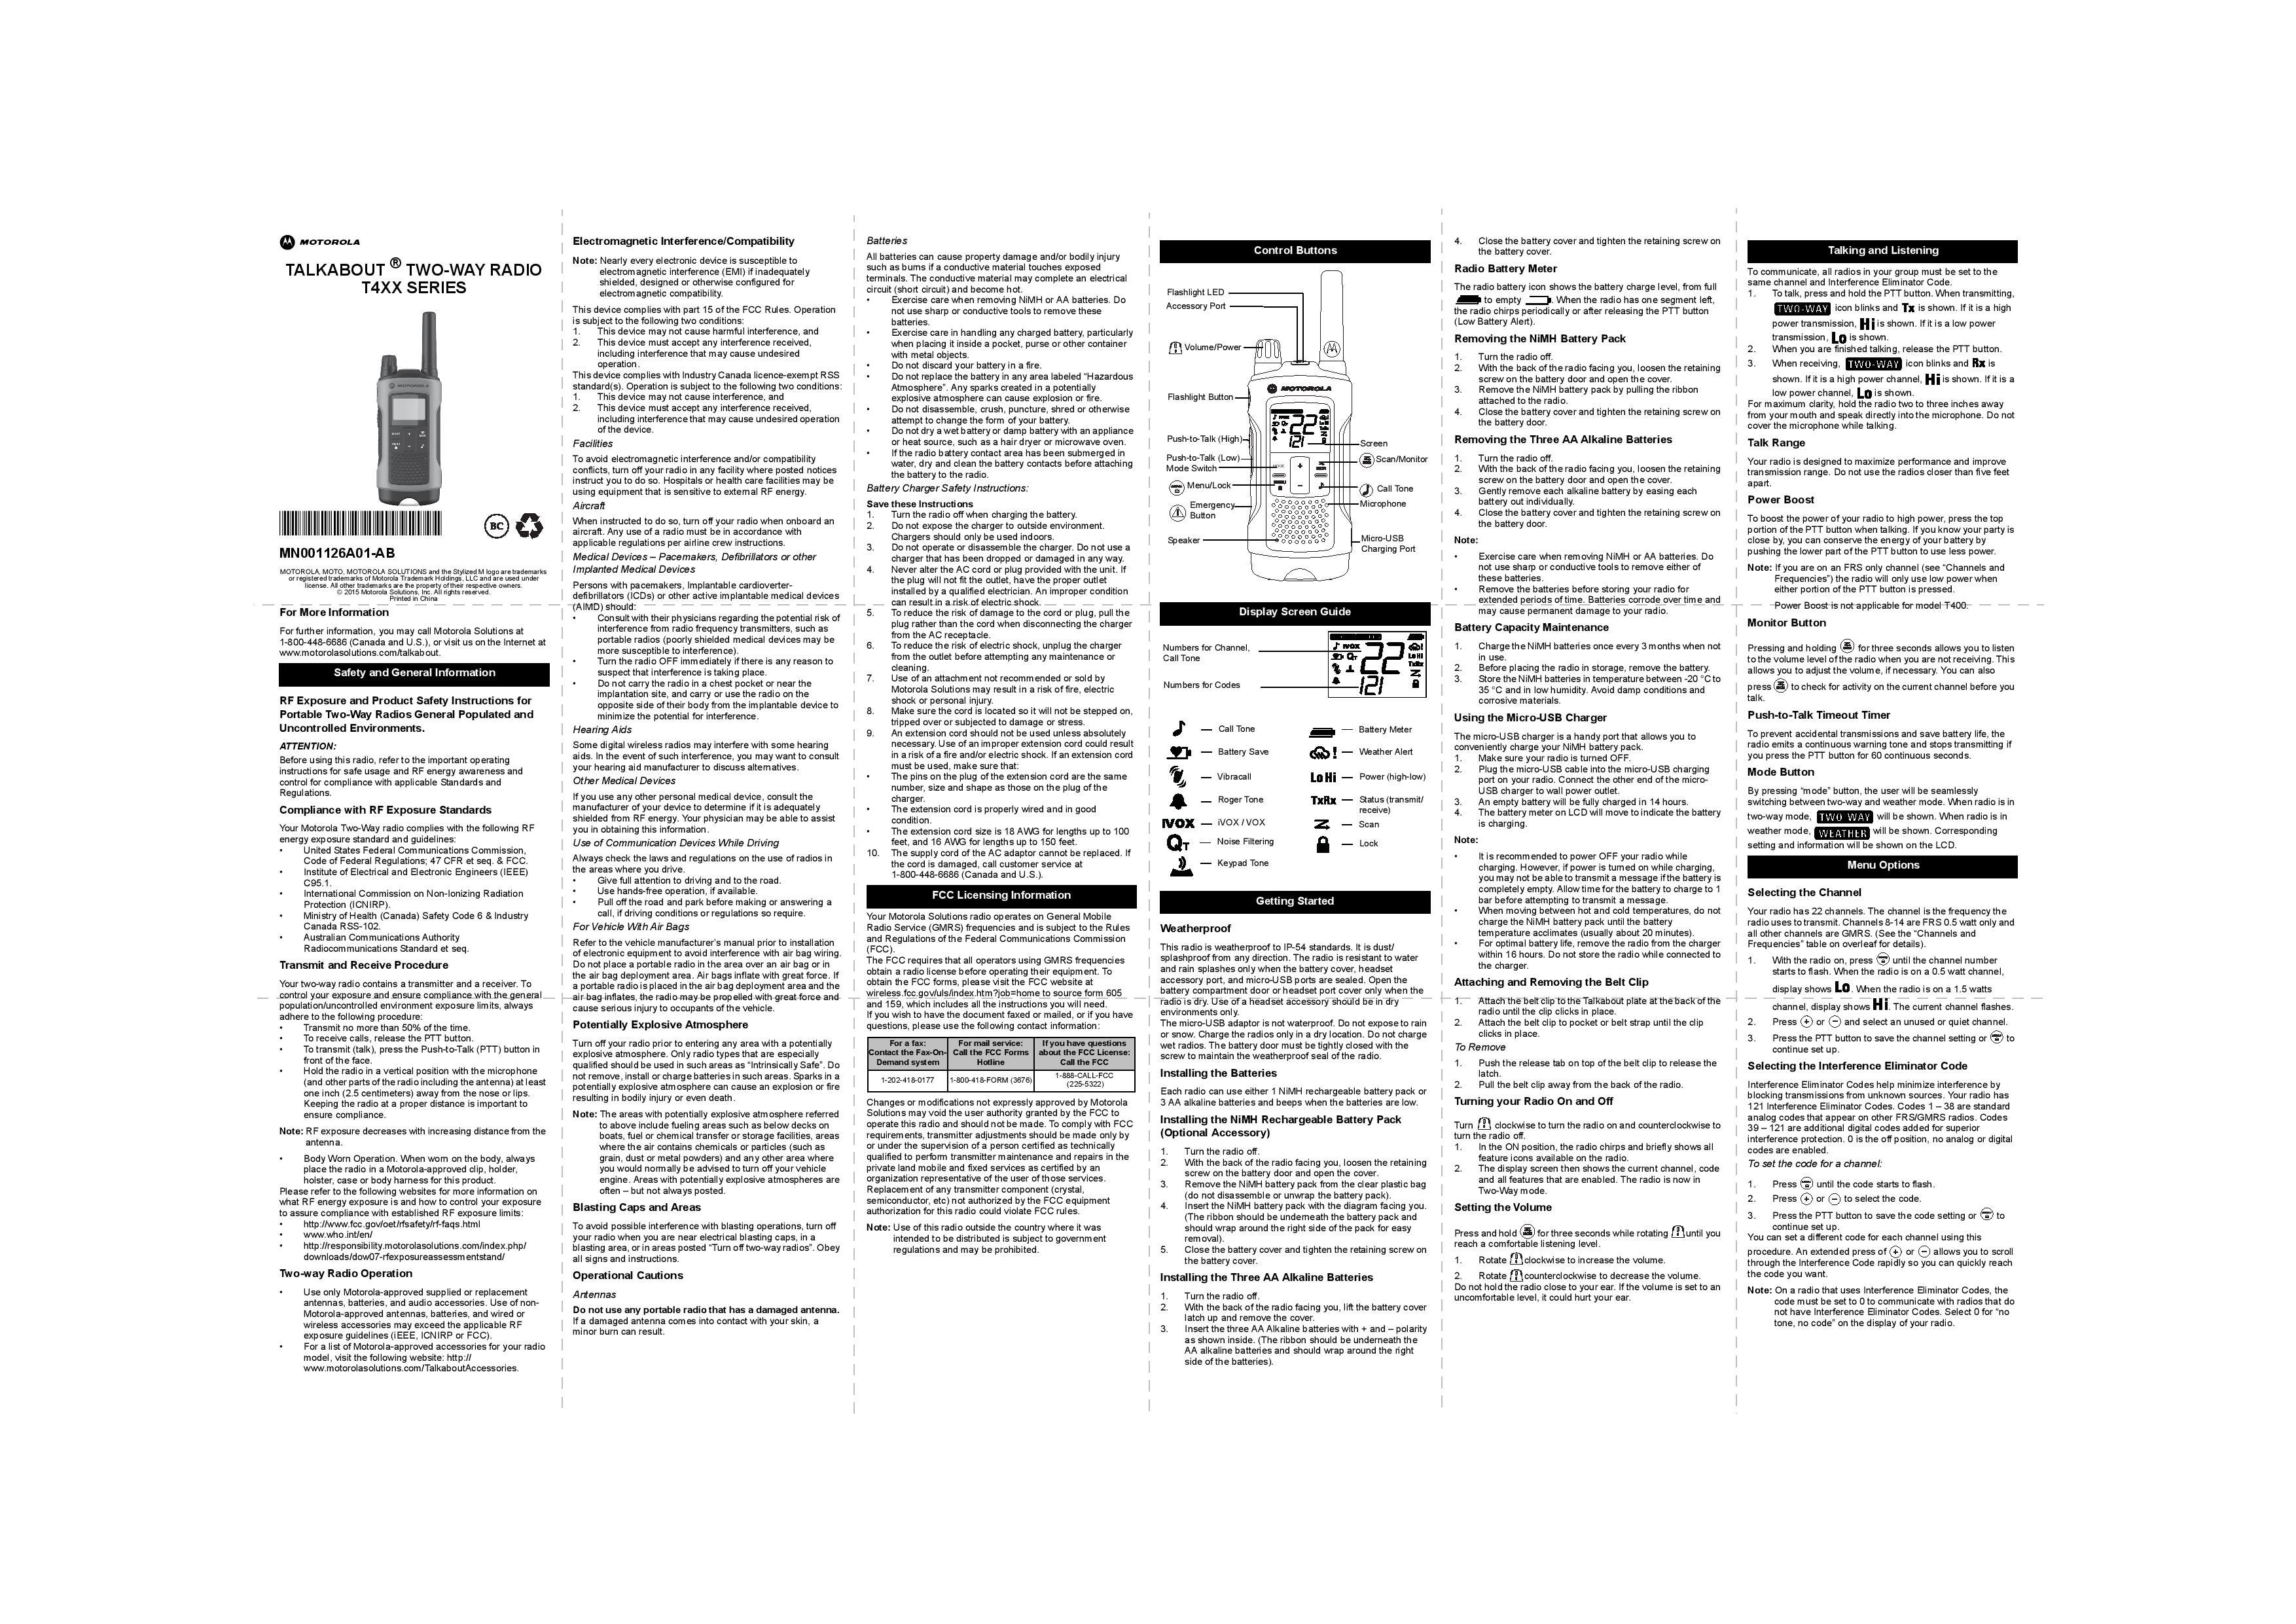 Radio motorola mr355 manual pdf